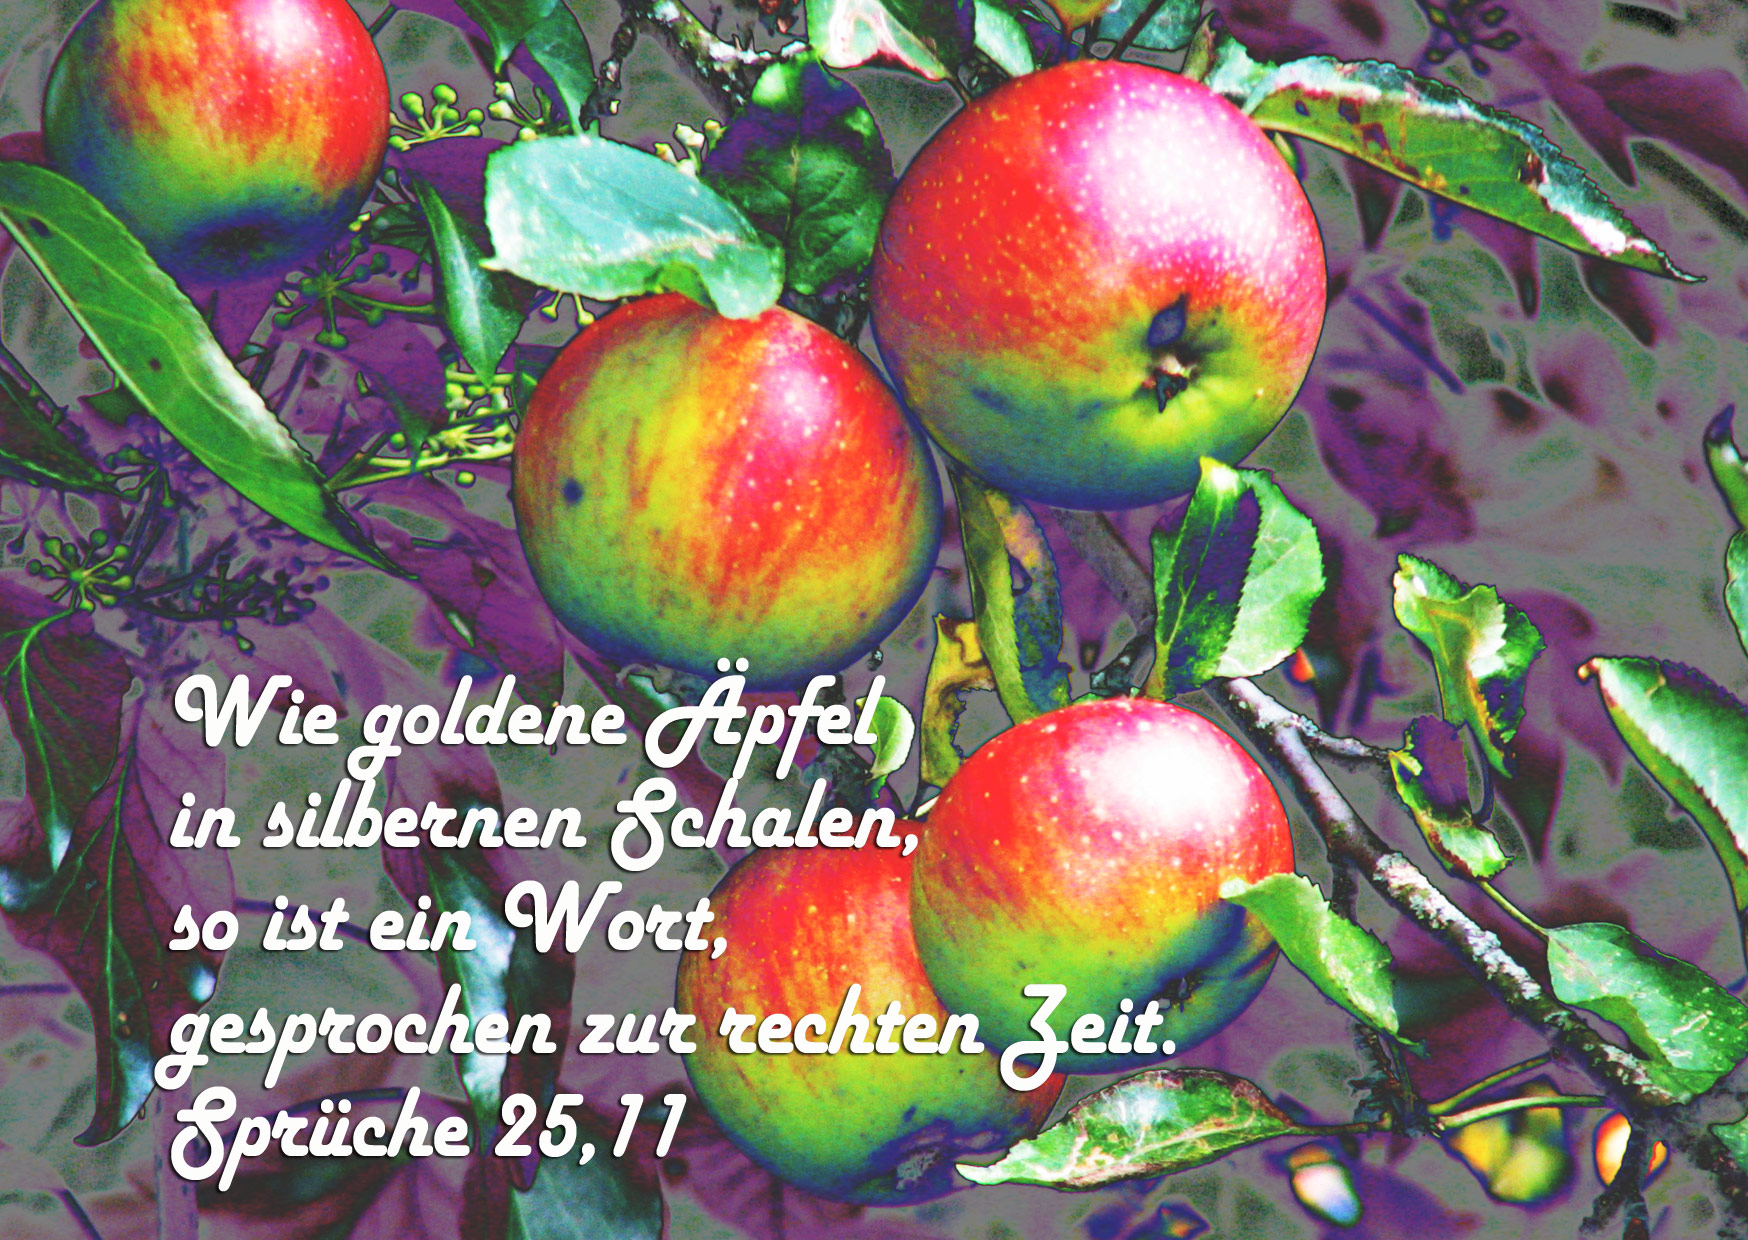 Bibelzitat, Sprüche 25,11, Foto: Danzer, Christine, go 4 Jesus